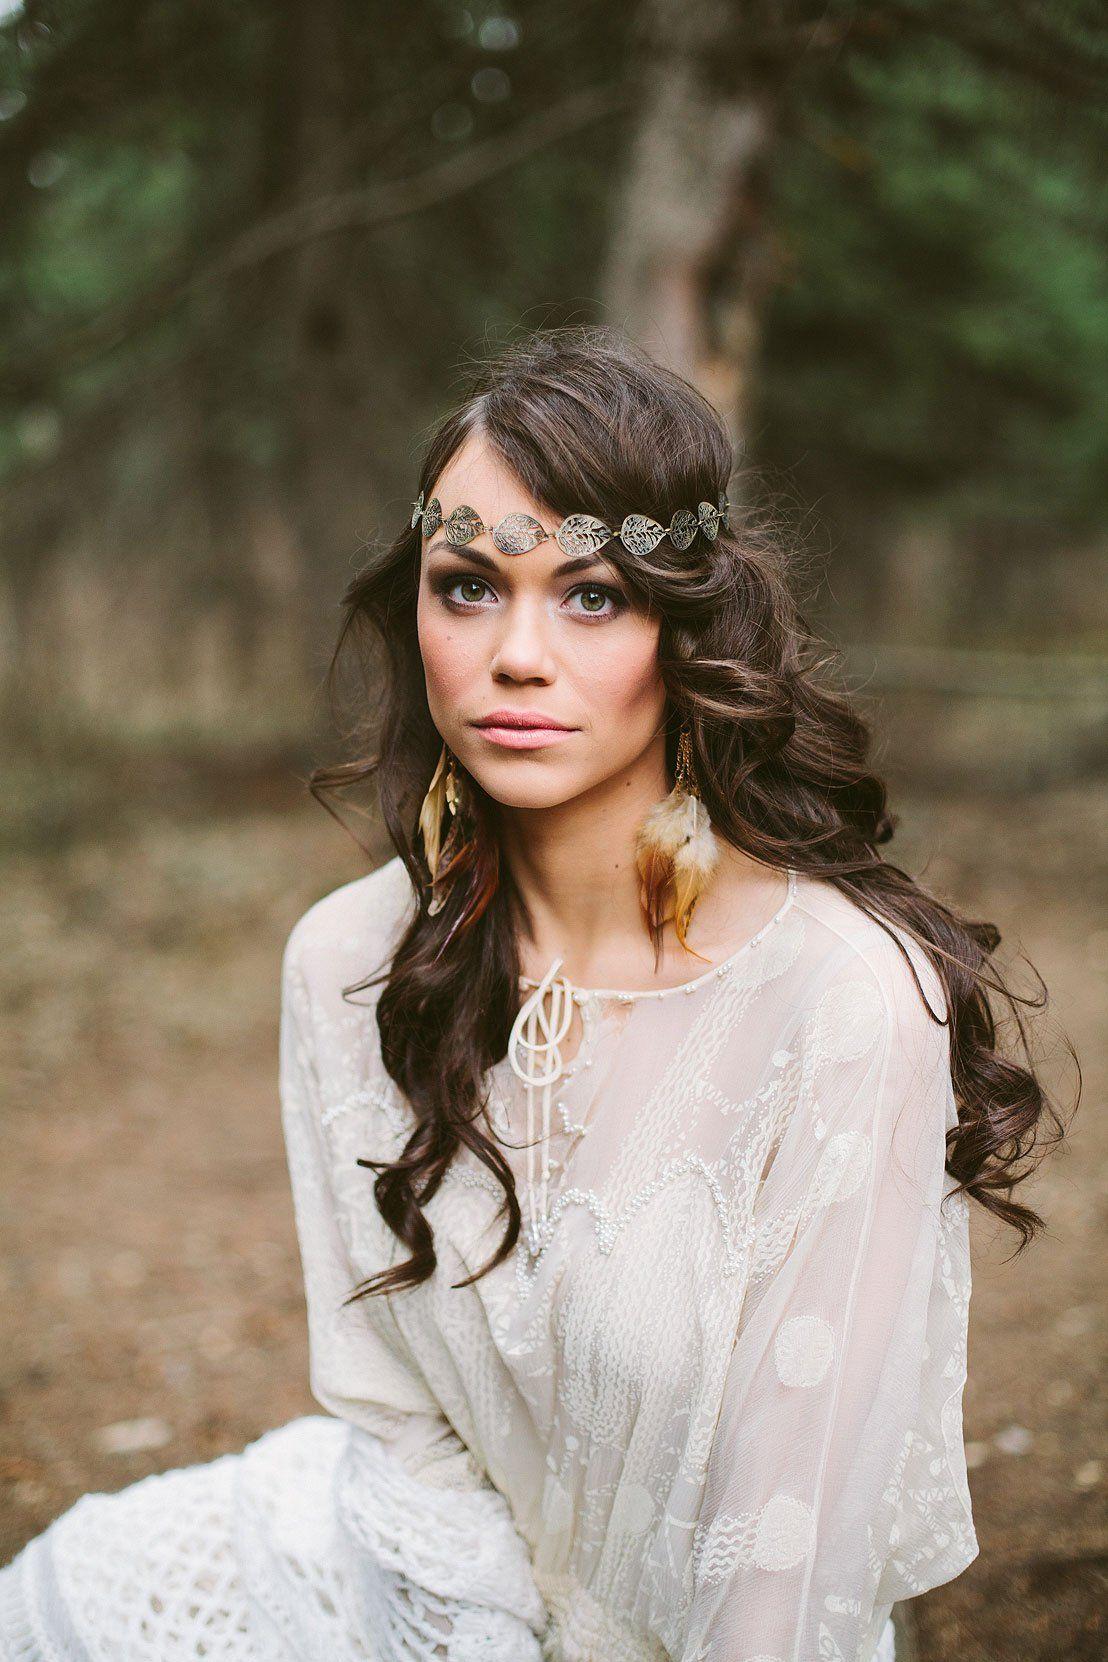 Amanda bohemian makeup artist in edmonton bohemian